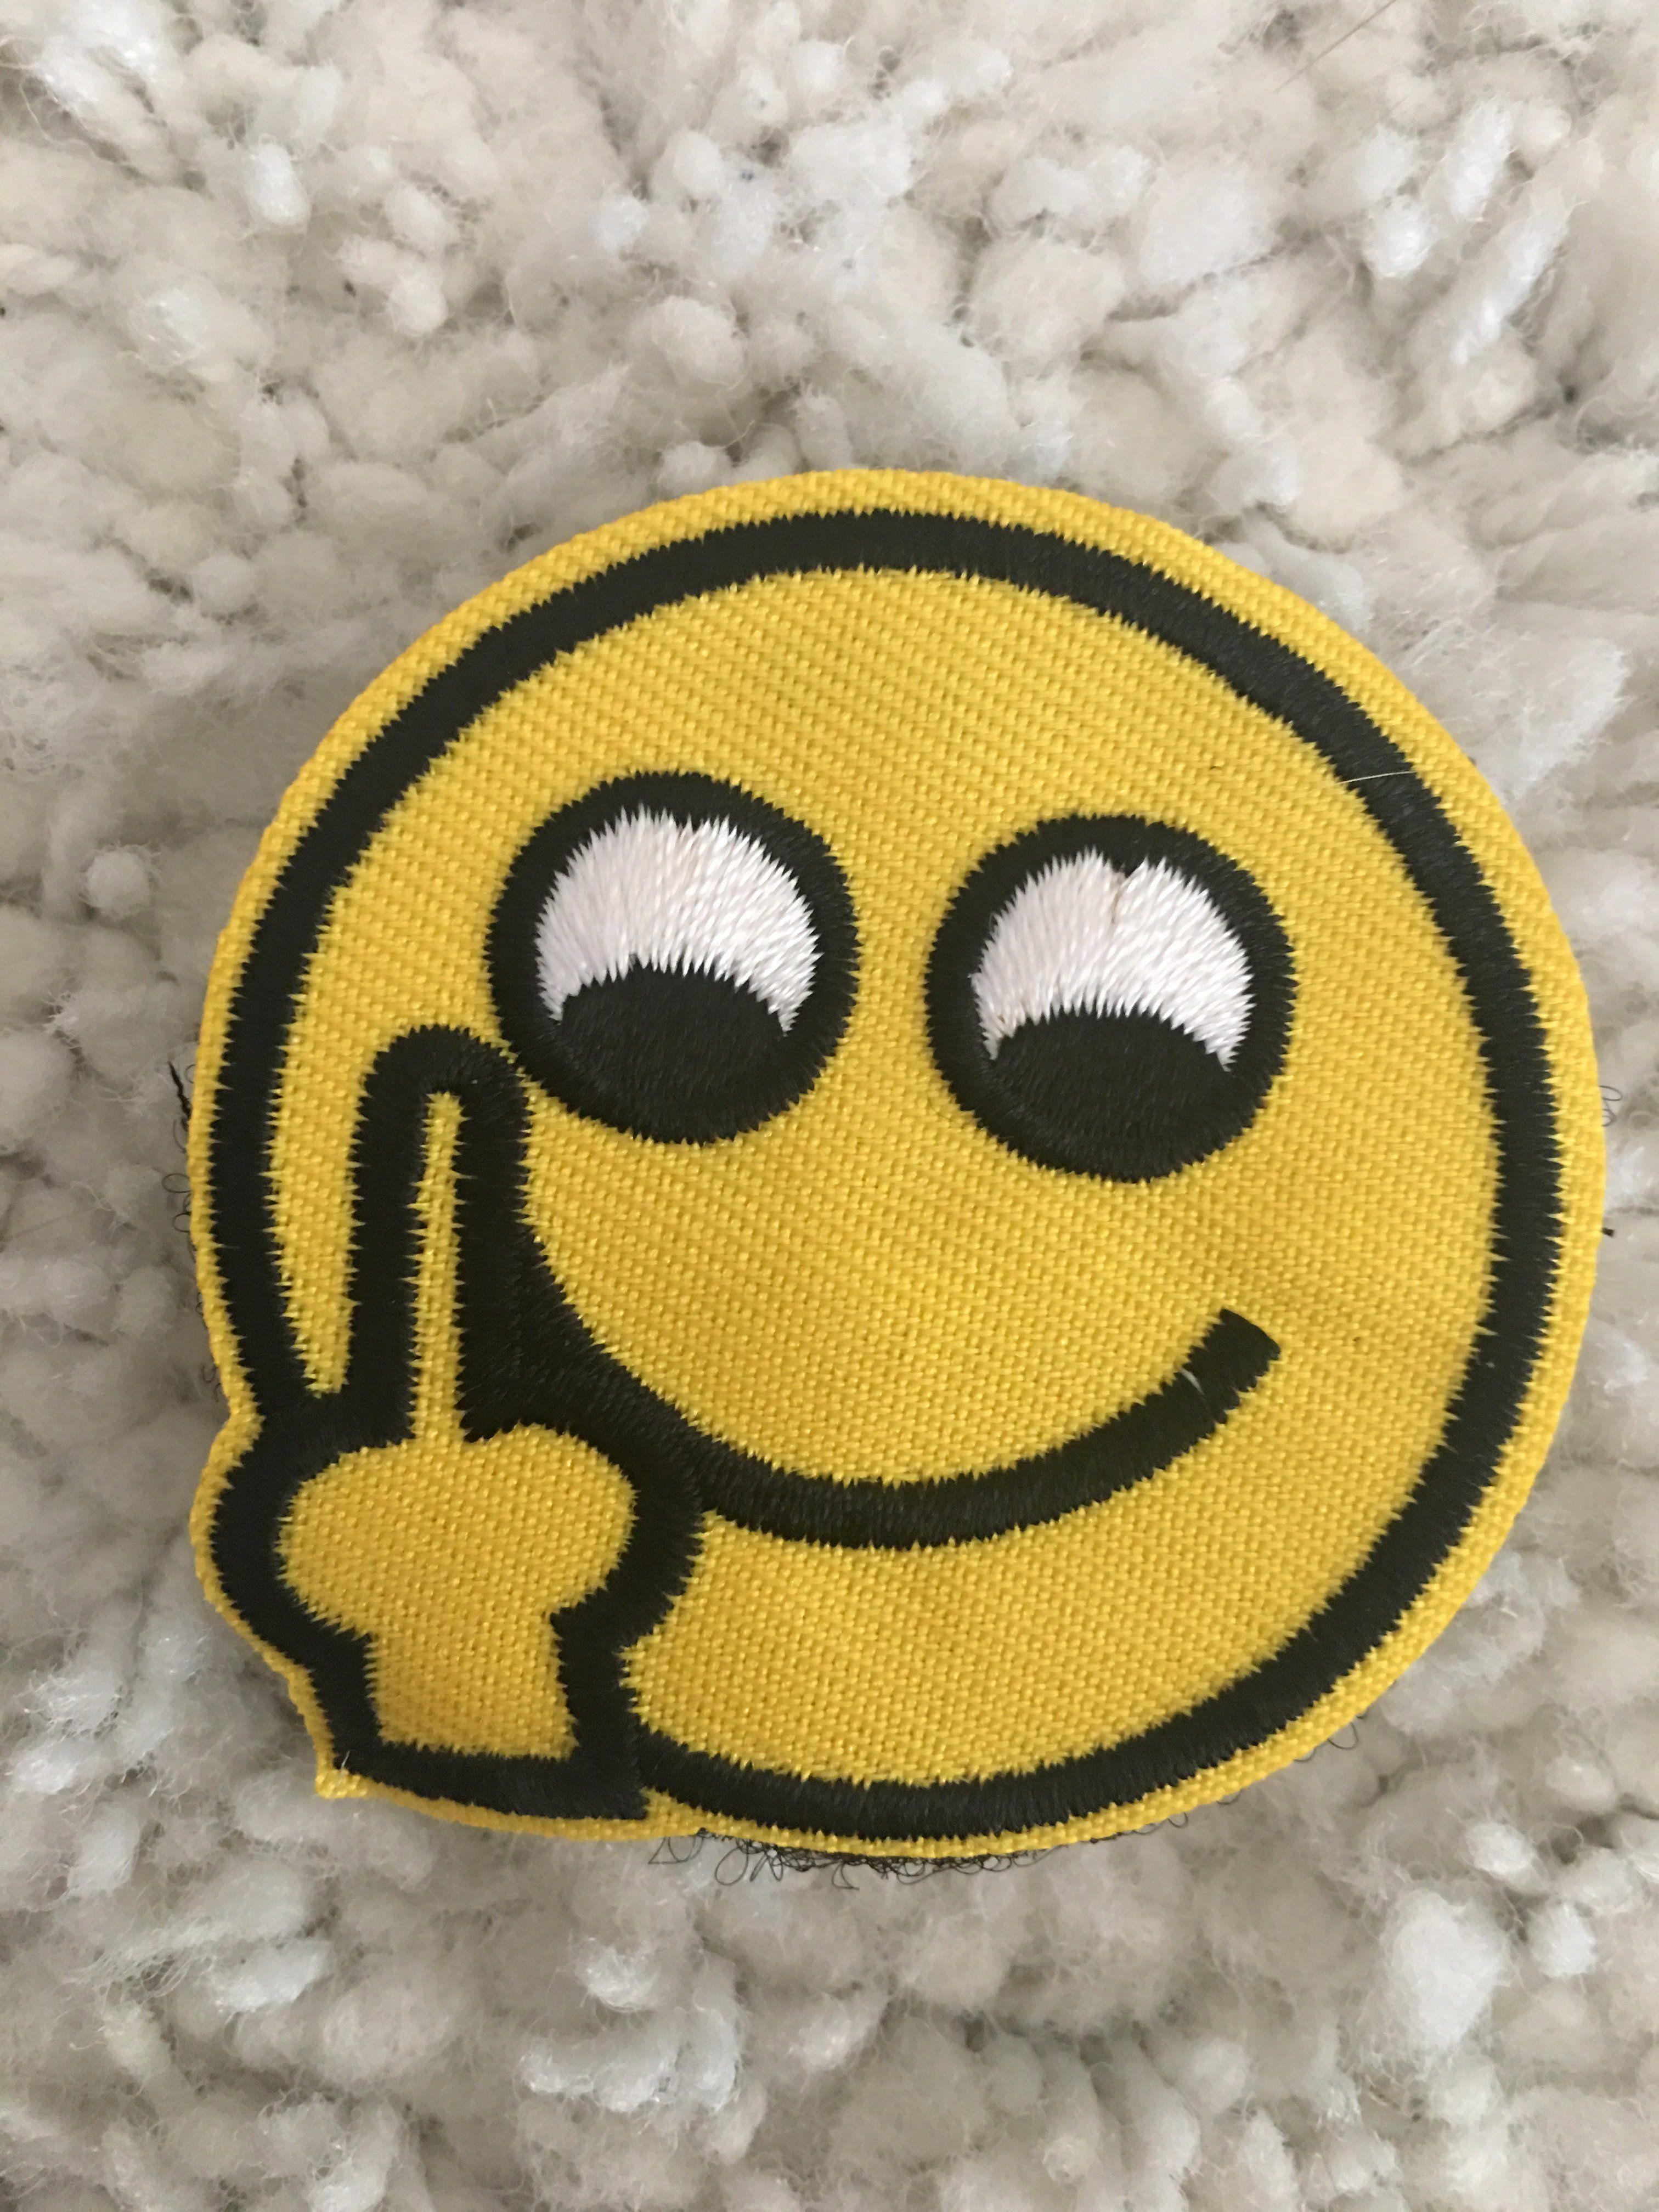 Naughty emoji emoji and products naughty emoji biocorpaavc